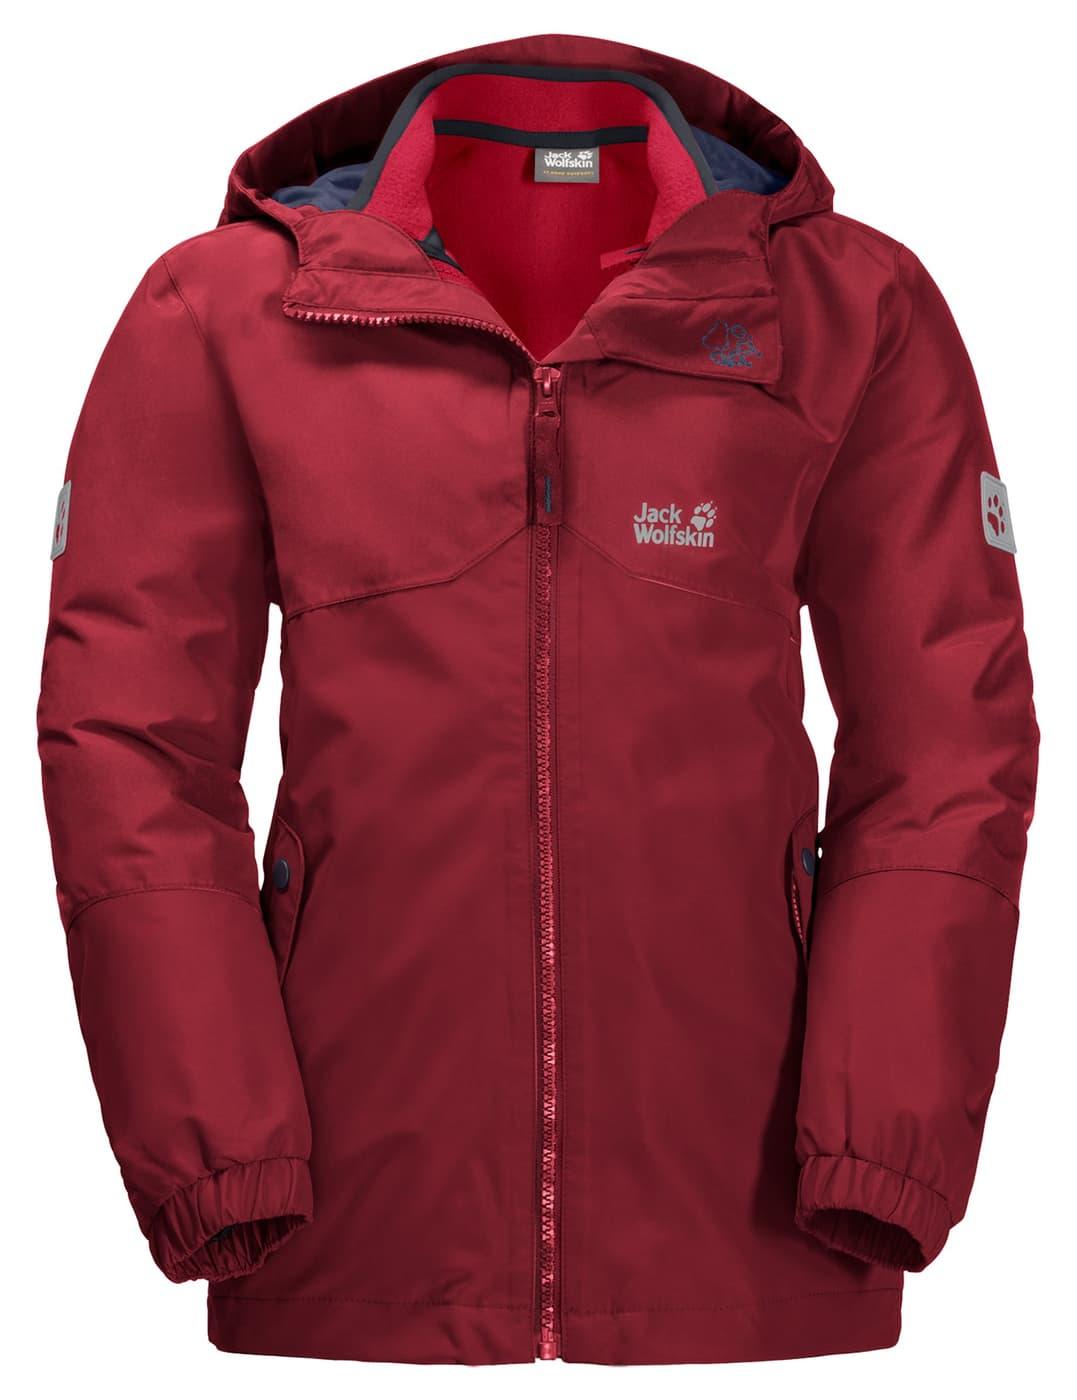 online store e3606 27c1f Jack Wolfskin Iceland Kinder Trekking 3in1 Jacke